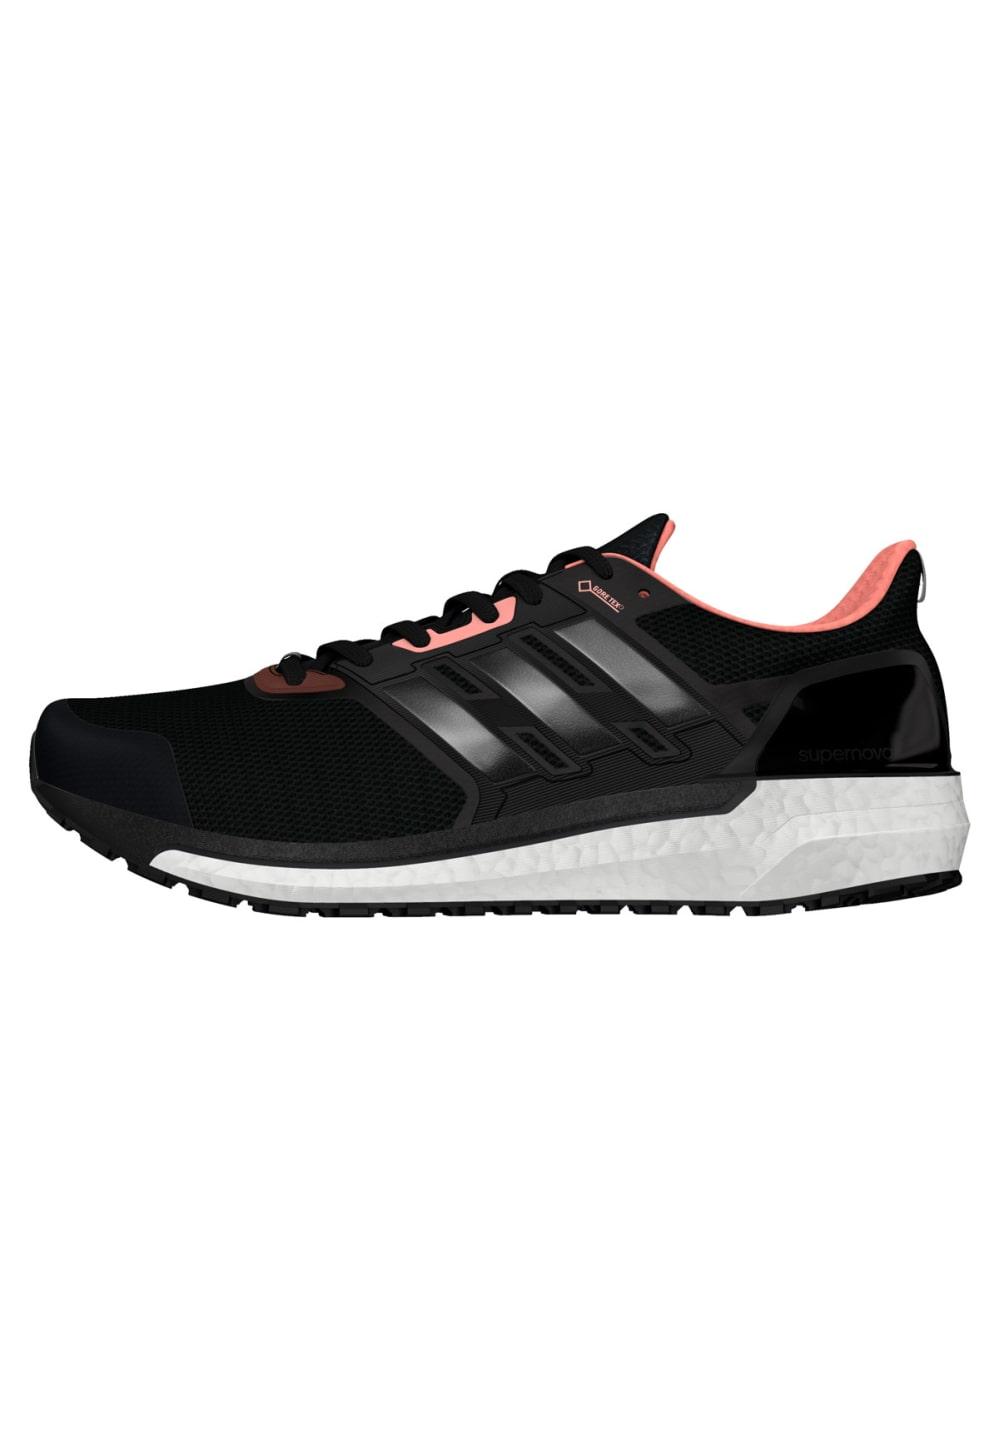 the latest 695c7 5fc13 adidas Supernova Gore-Tex - Running shoes for Women - Black   21RUN